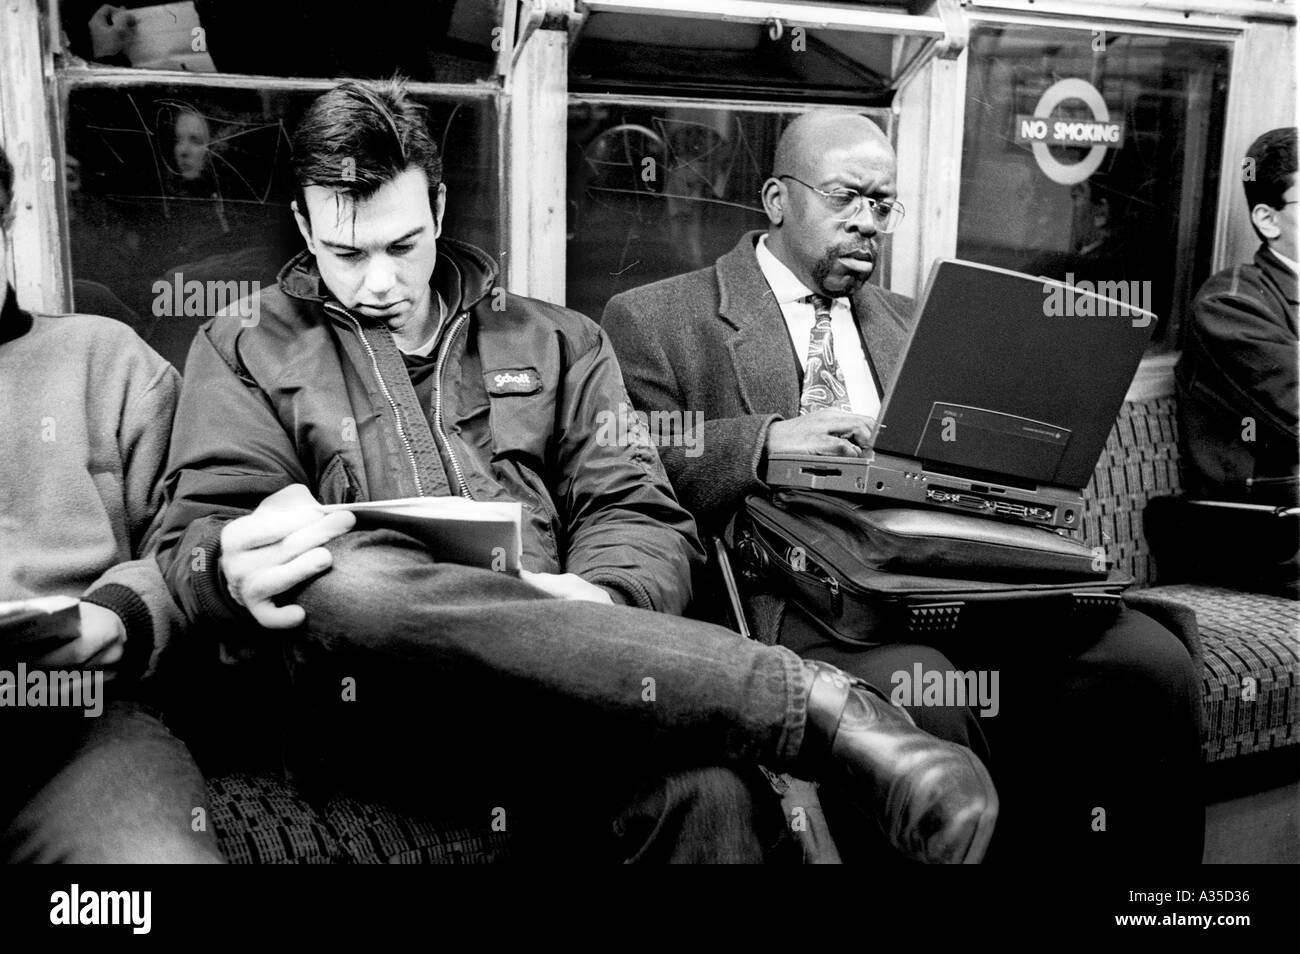 Man doing his Homework on the tube London England Britain UK - Stock Image